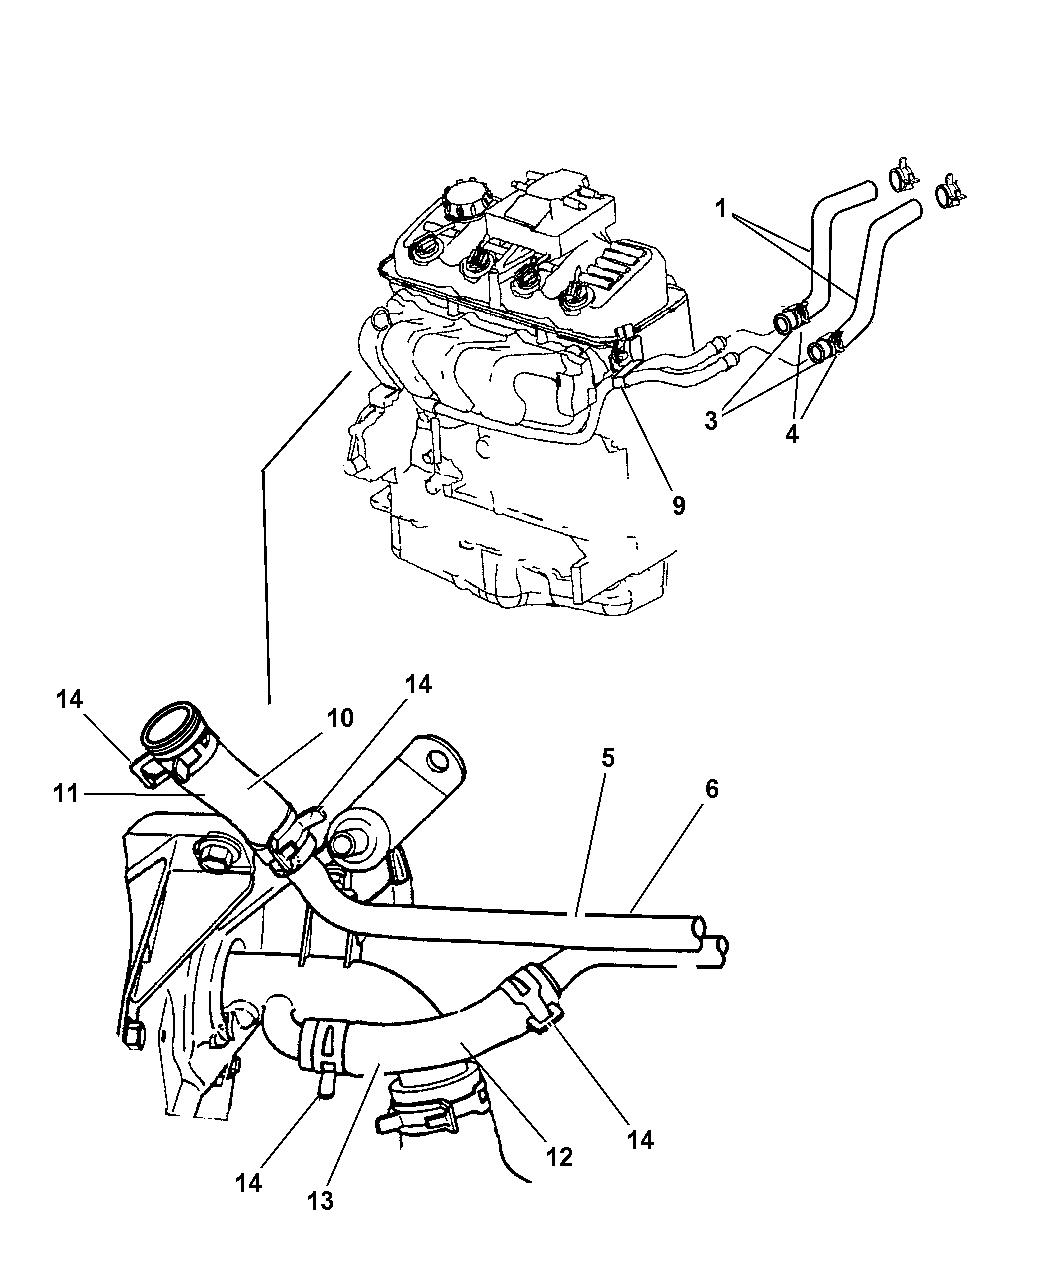 4777036 - Genuine Dodge TUBE-HEATER CORE